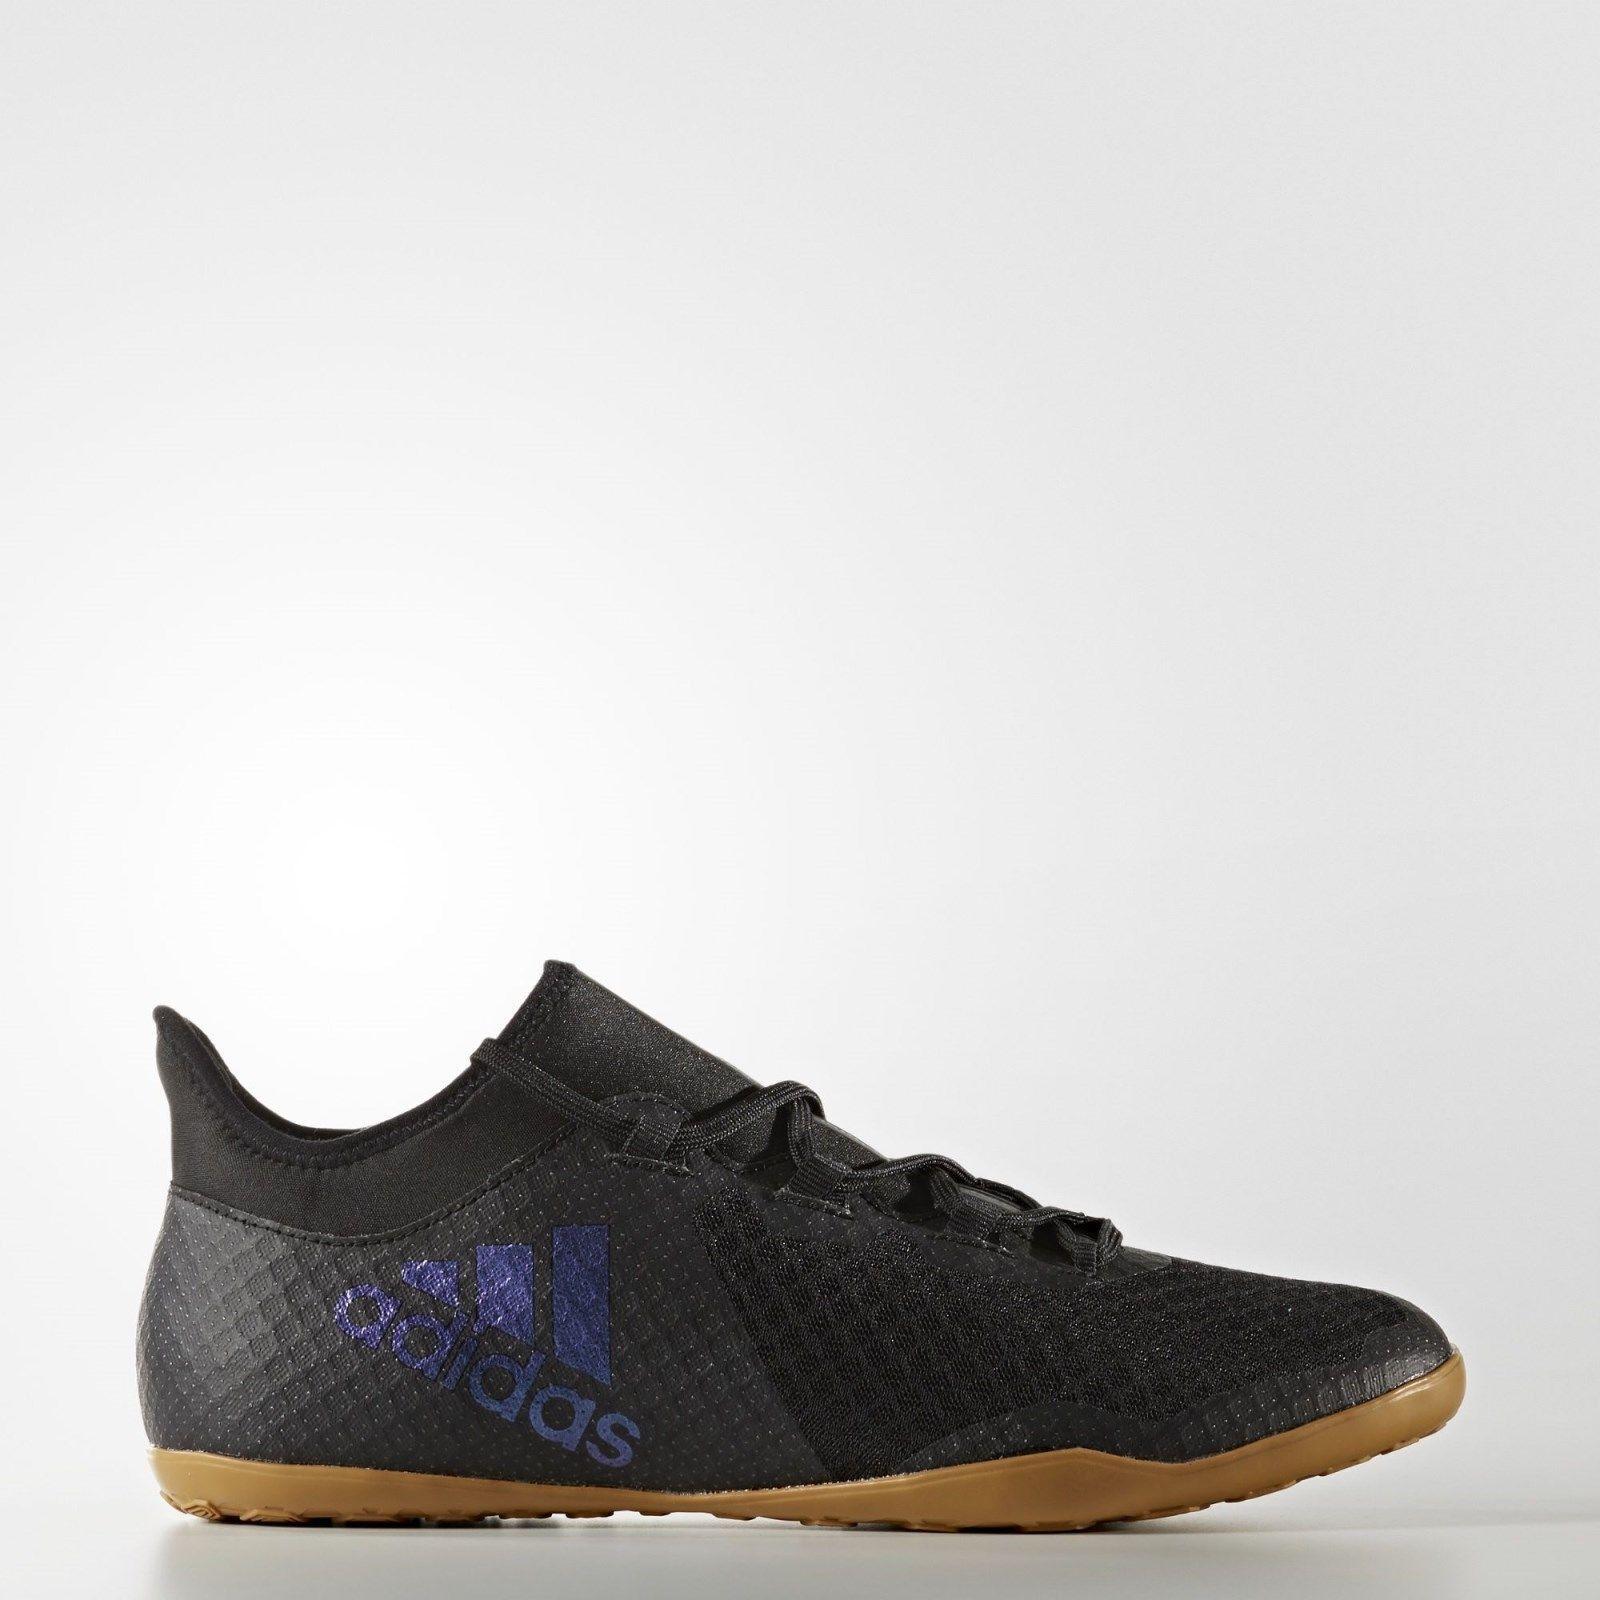 Adidas Soccer Men's X Tango 17.3 Indoor Boots Size 13 us CG3716